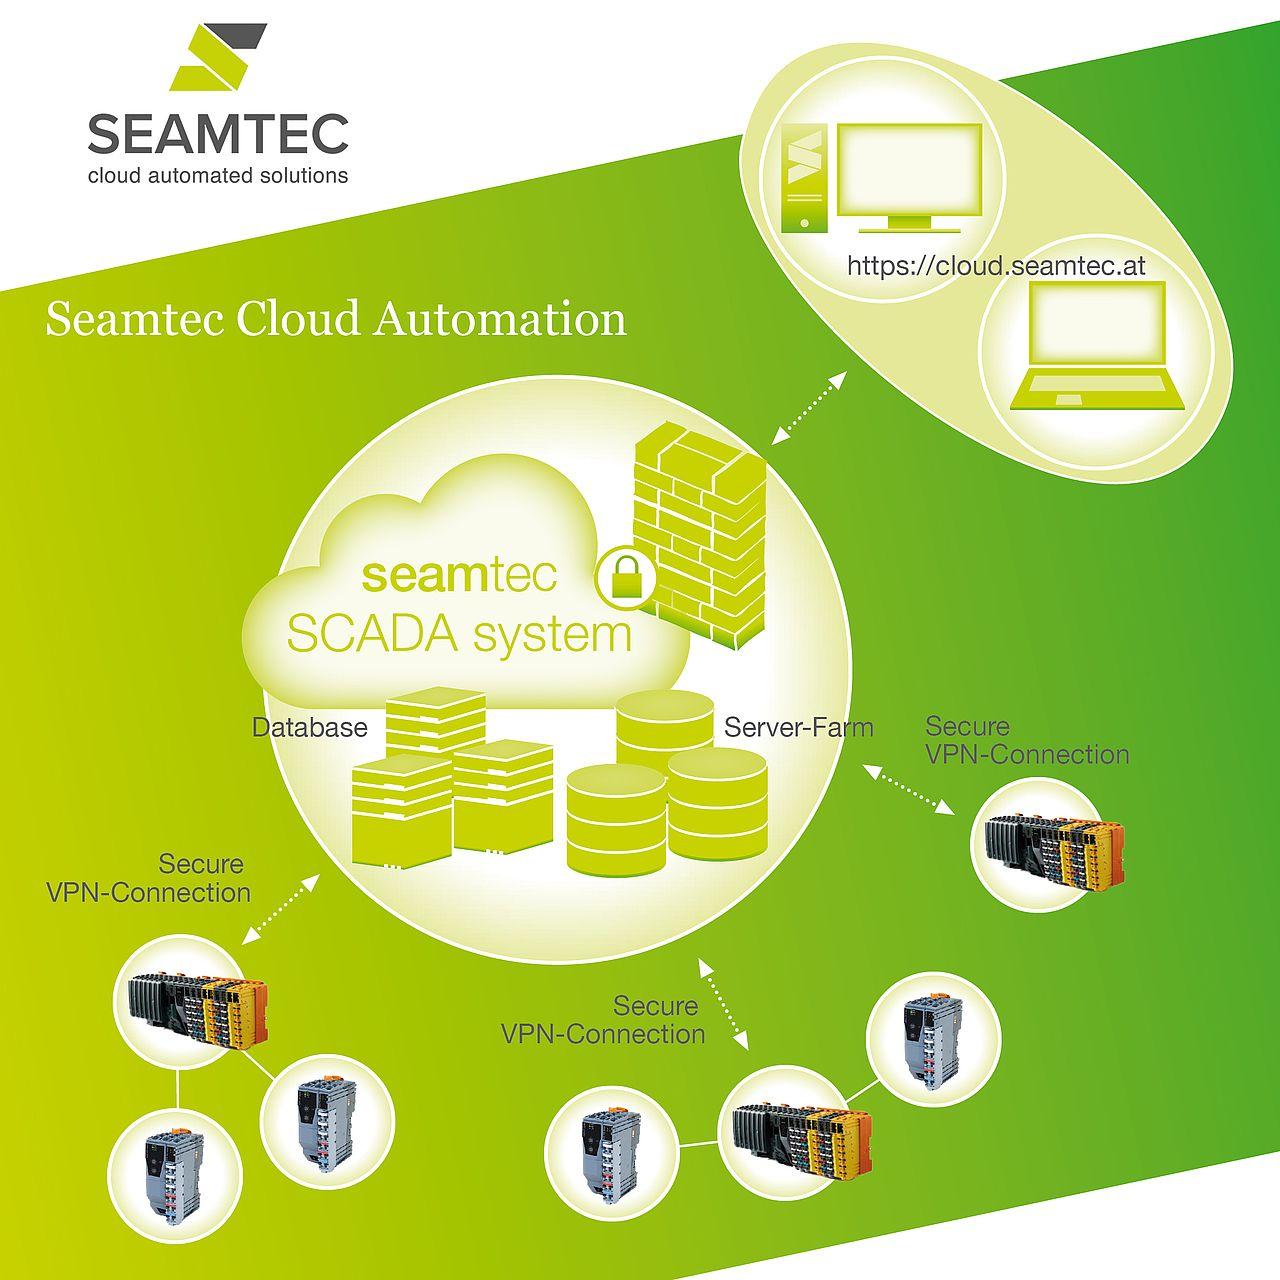 MeinStandort Rohrbach Seamtec Cloud Animation Infografik